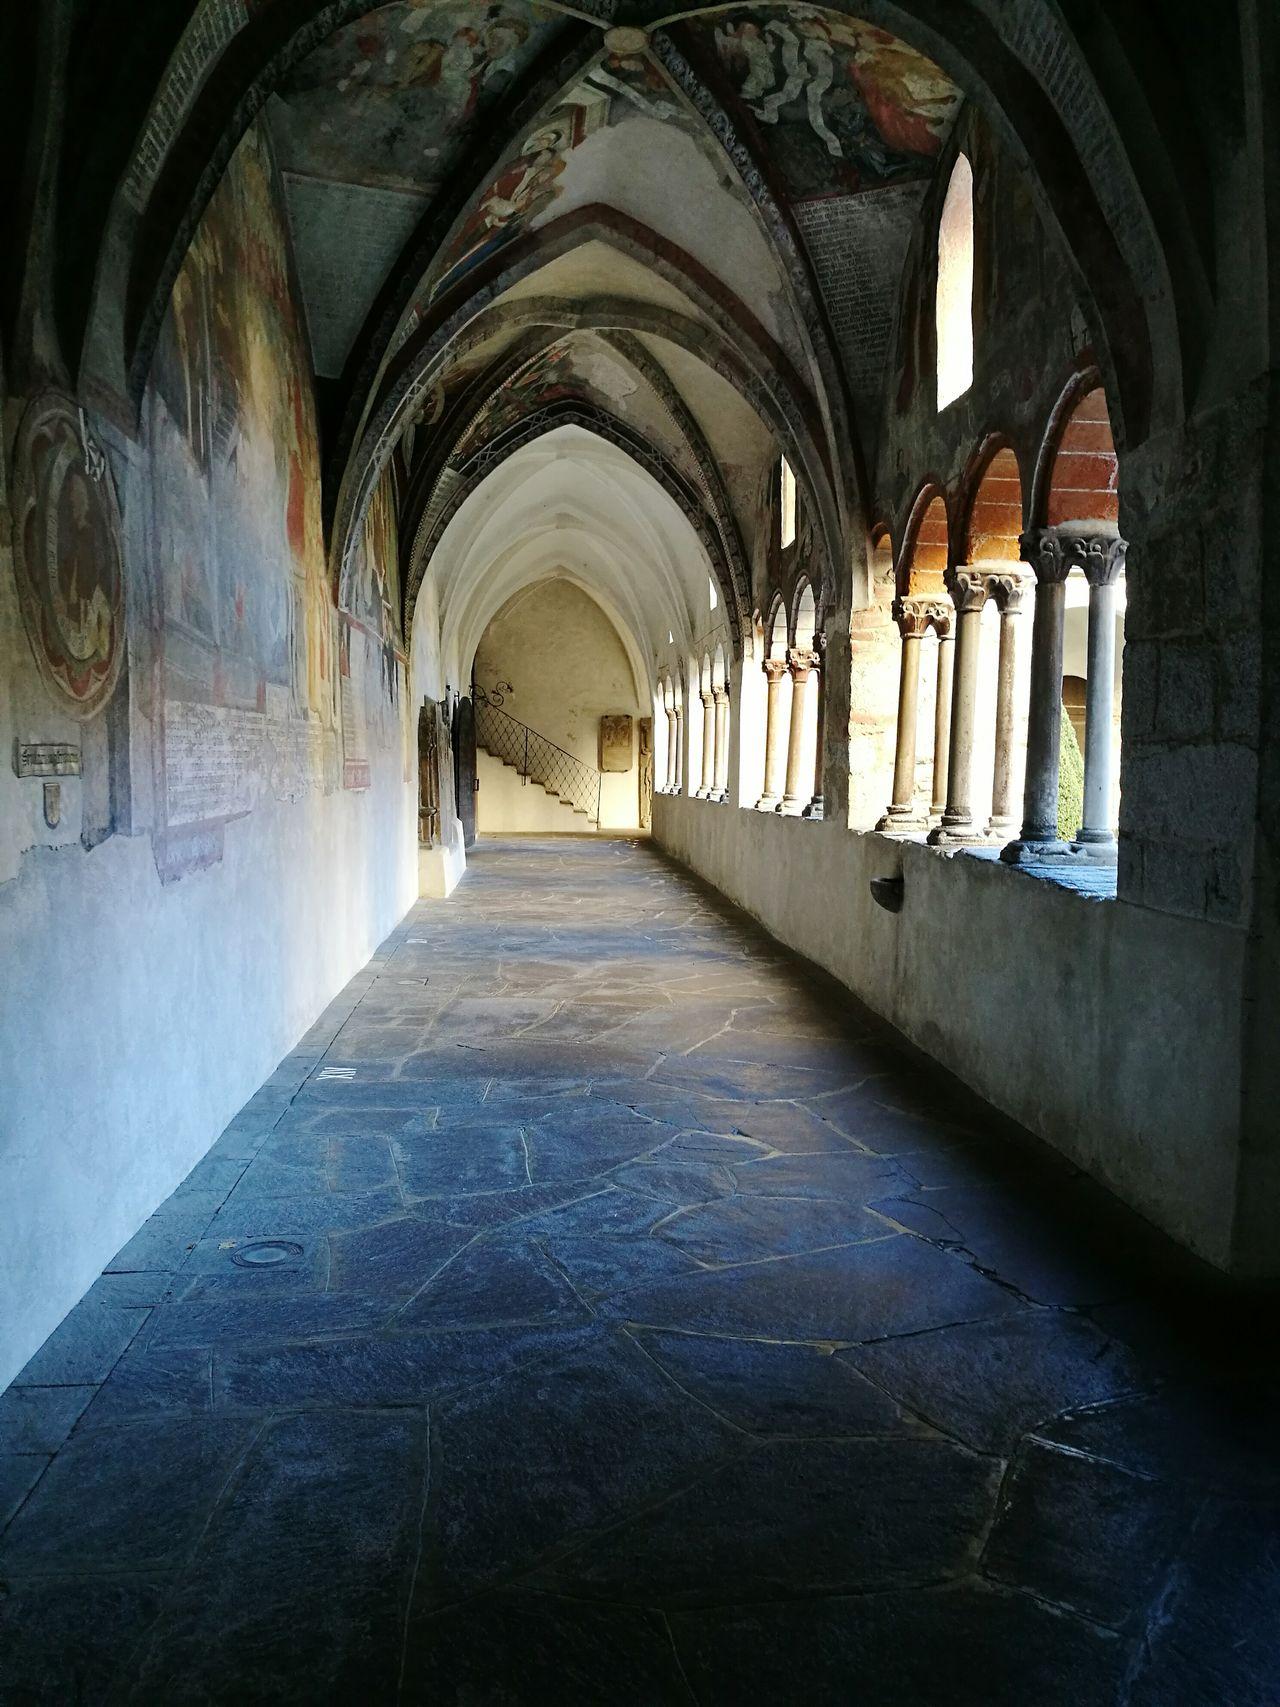 Bressasone chiostro duomo Arch History Travel Destinations No People Architecture Architectural Column Built Structure